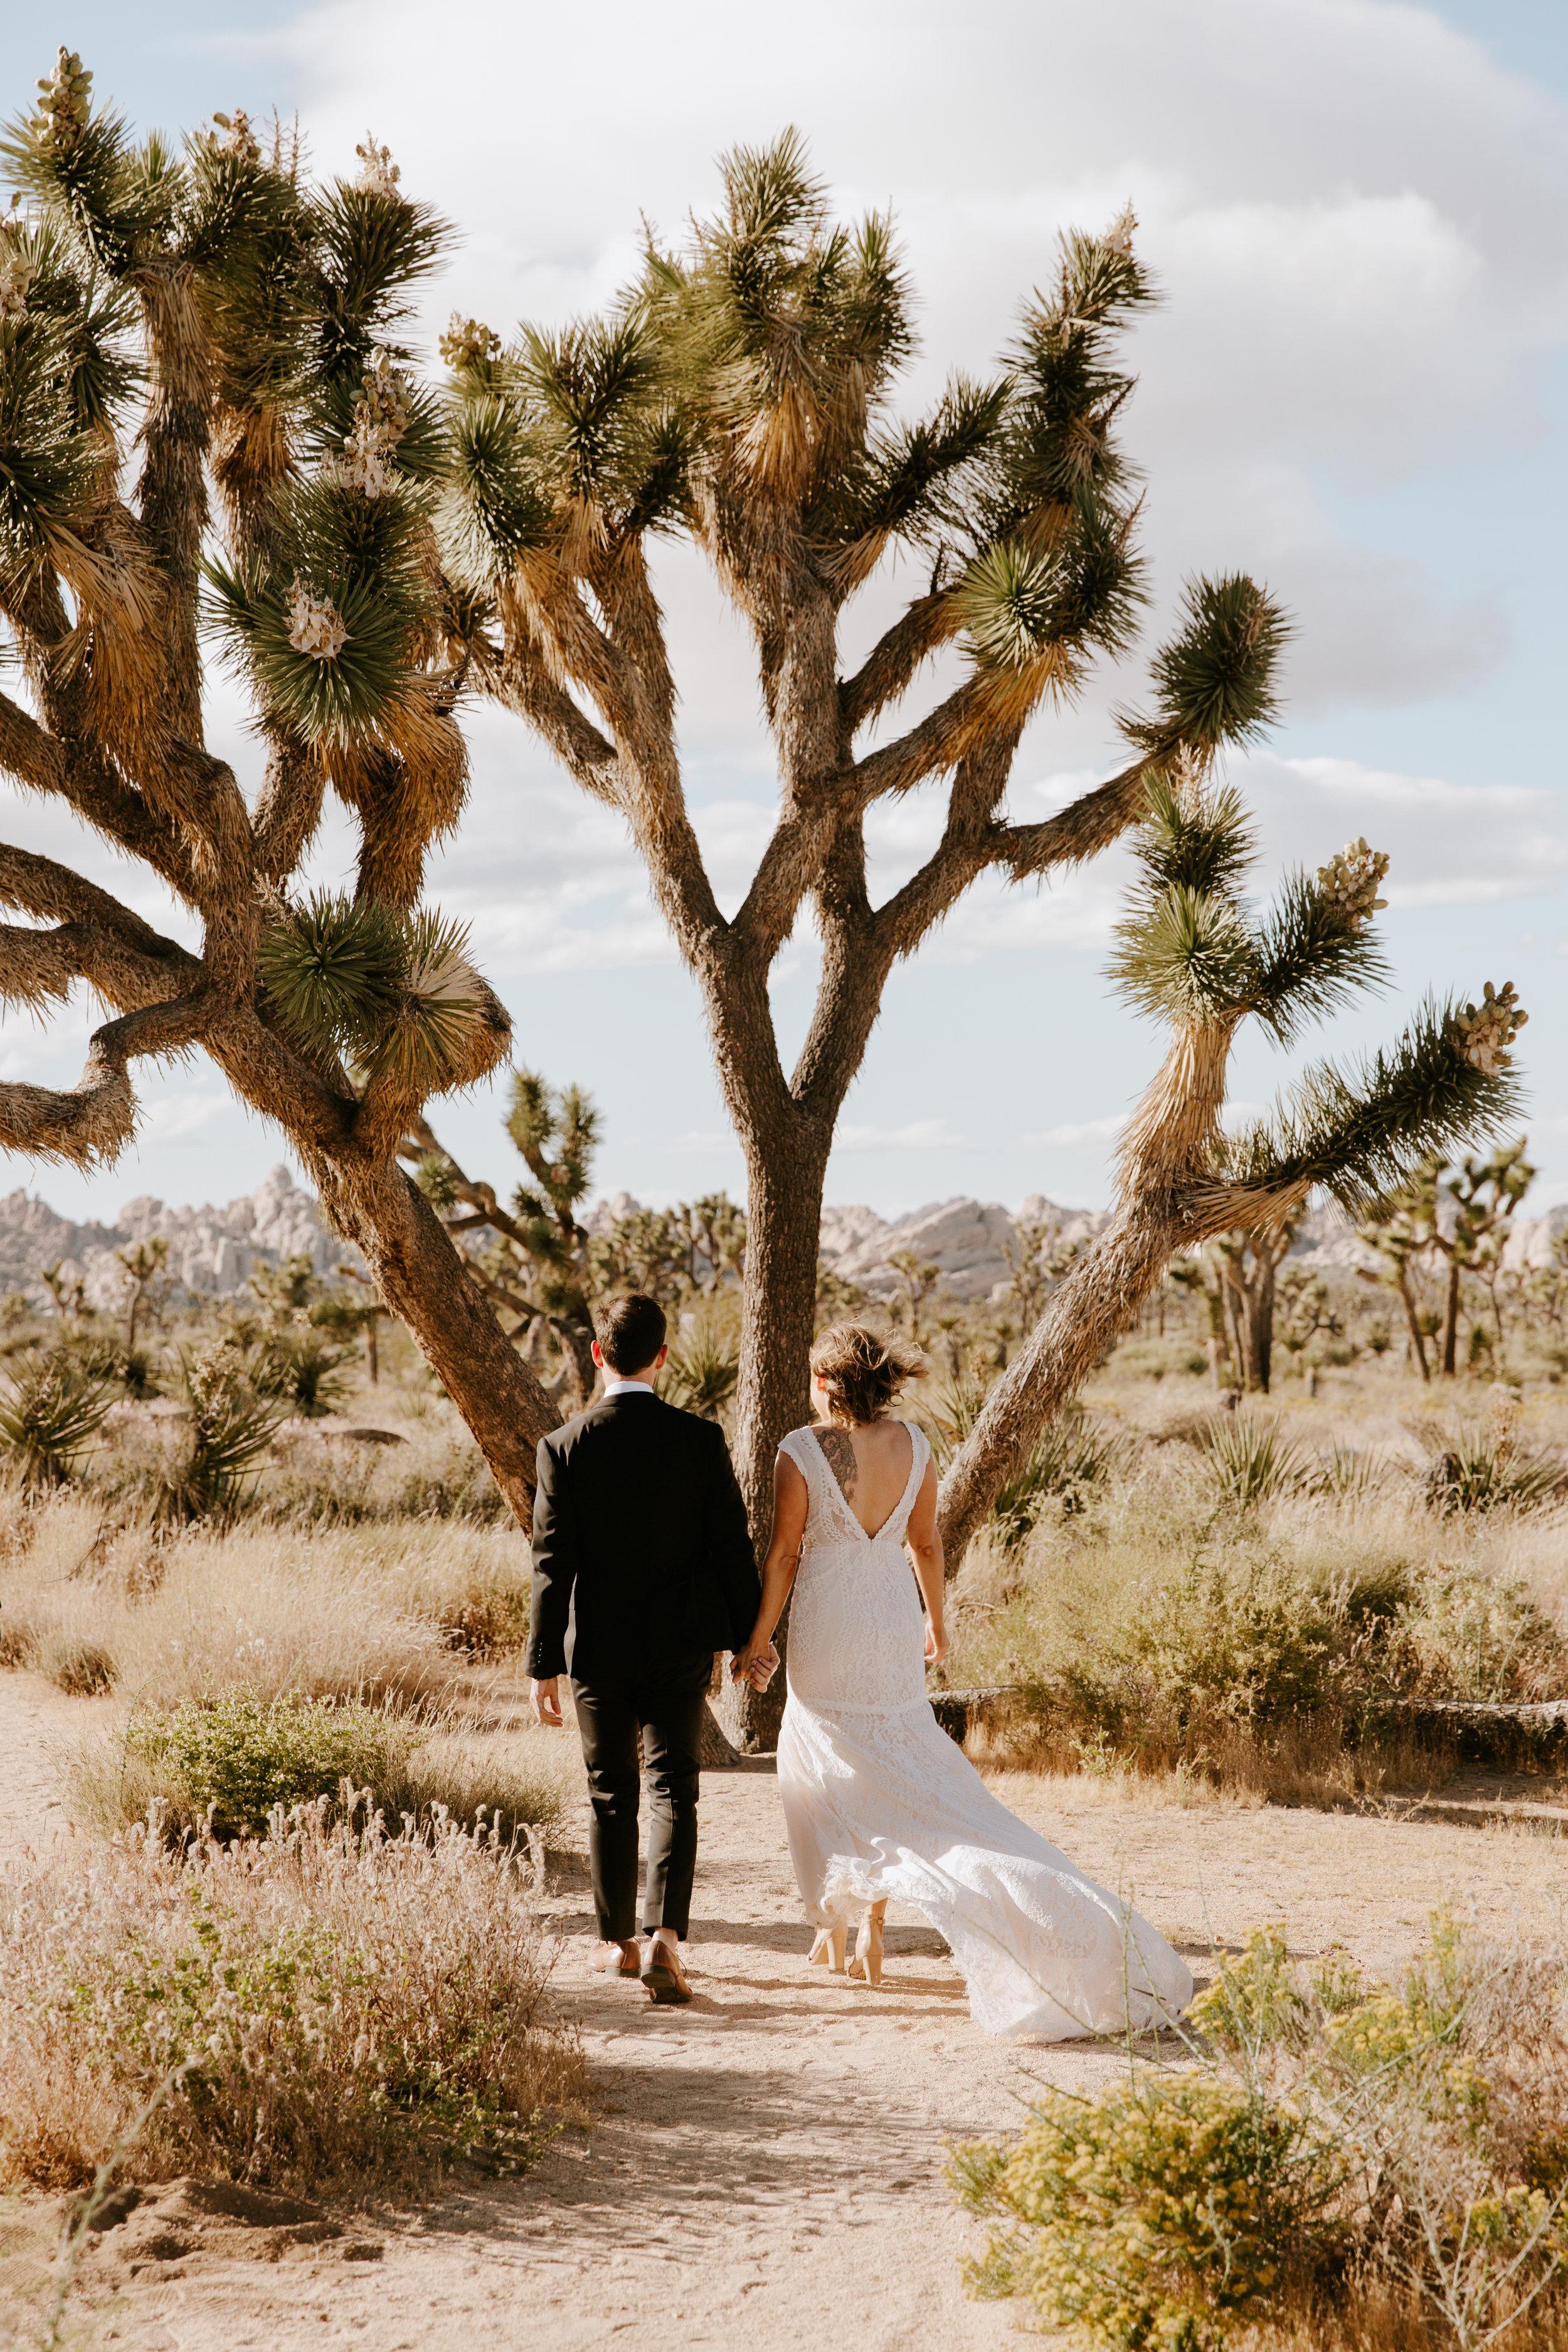 2019-05-26_Callie-Evan_Wedding_Joshua Tree_Paige Nelson_PREVIEWS HR-40.jpg